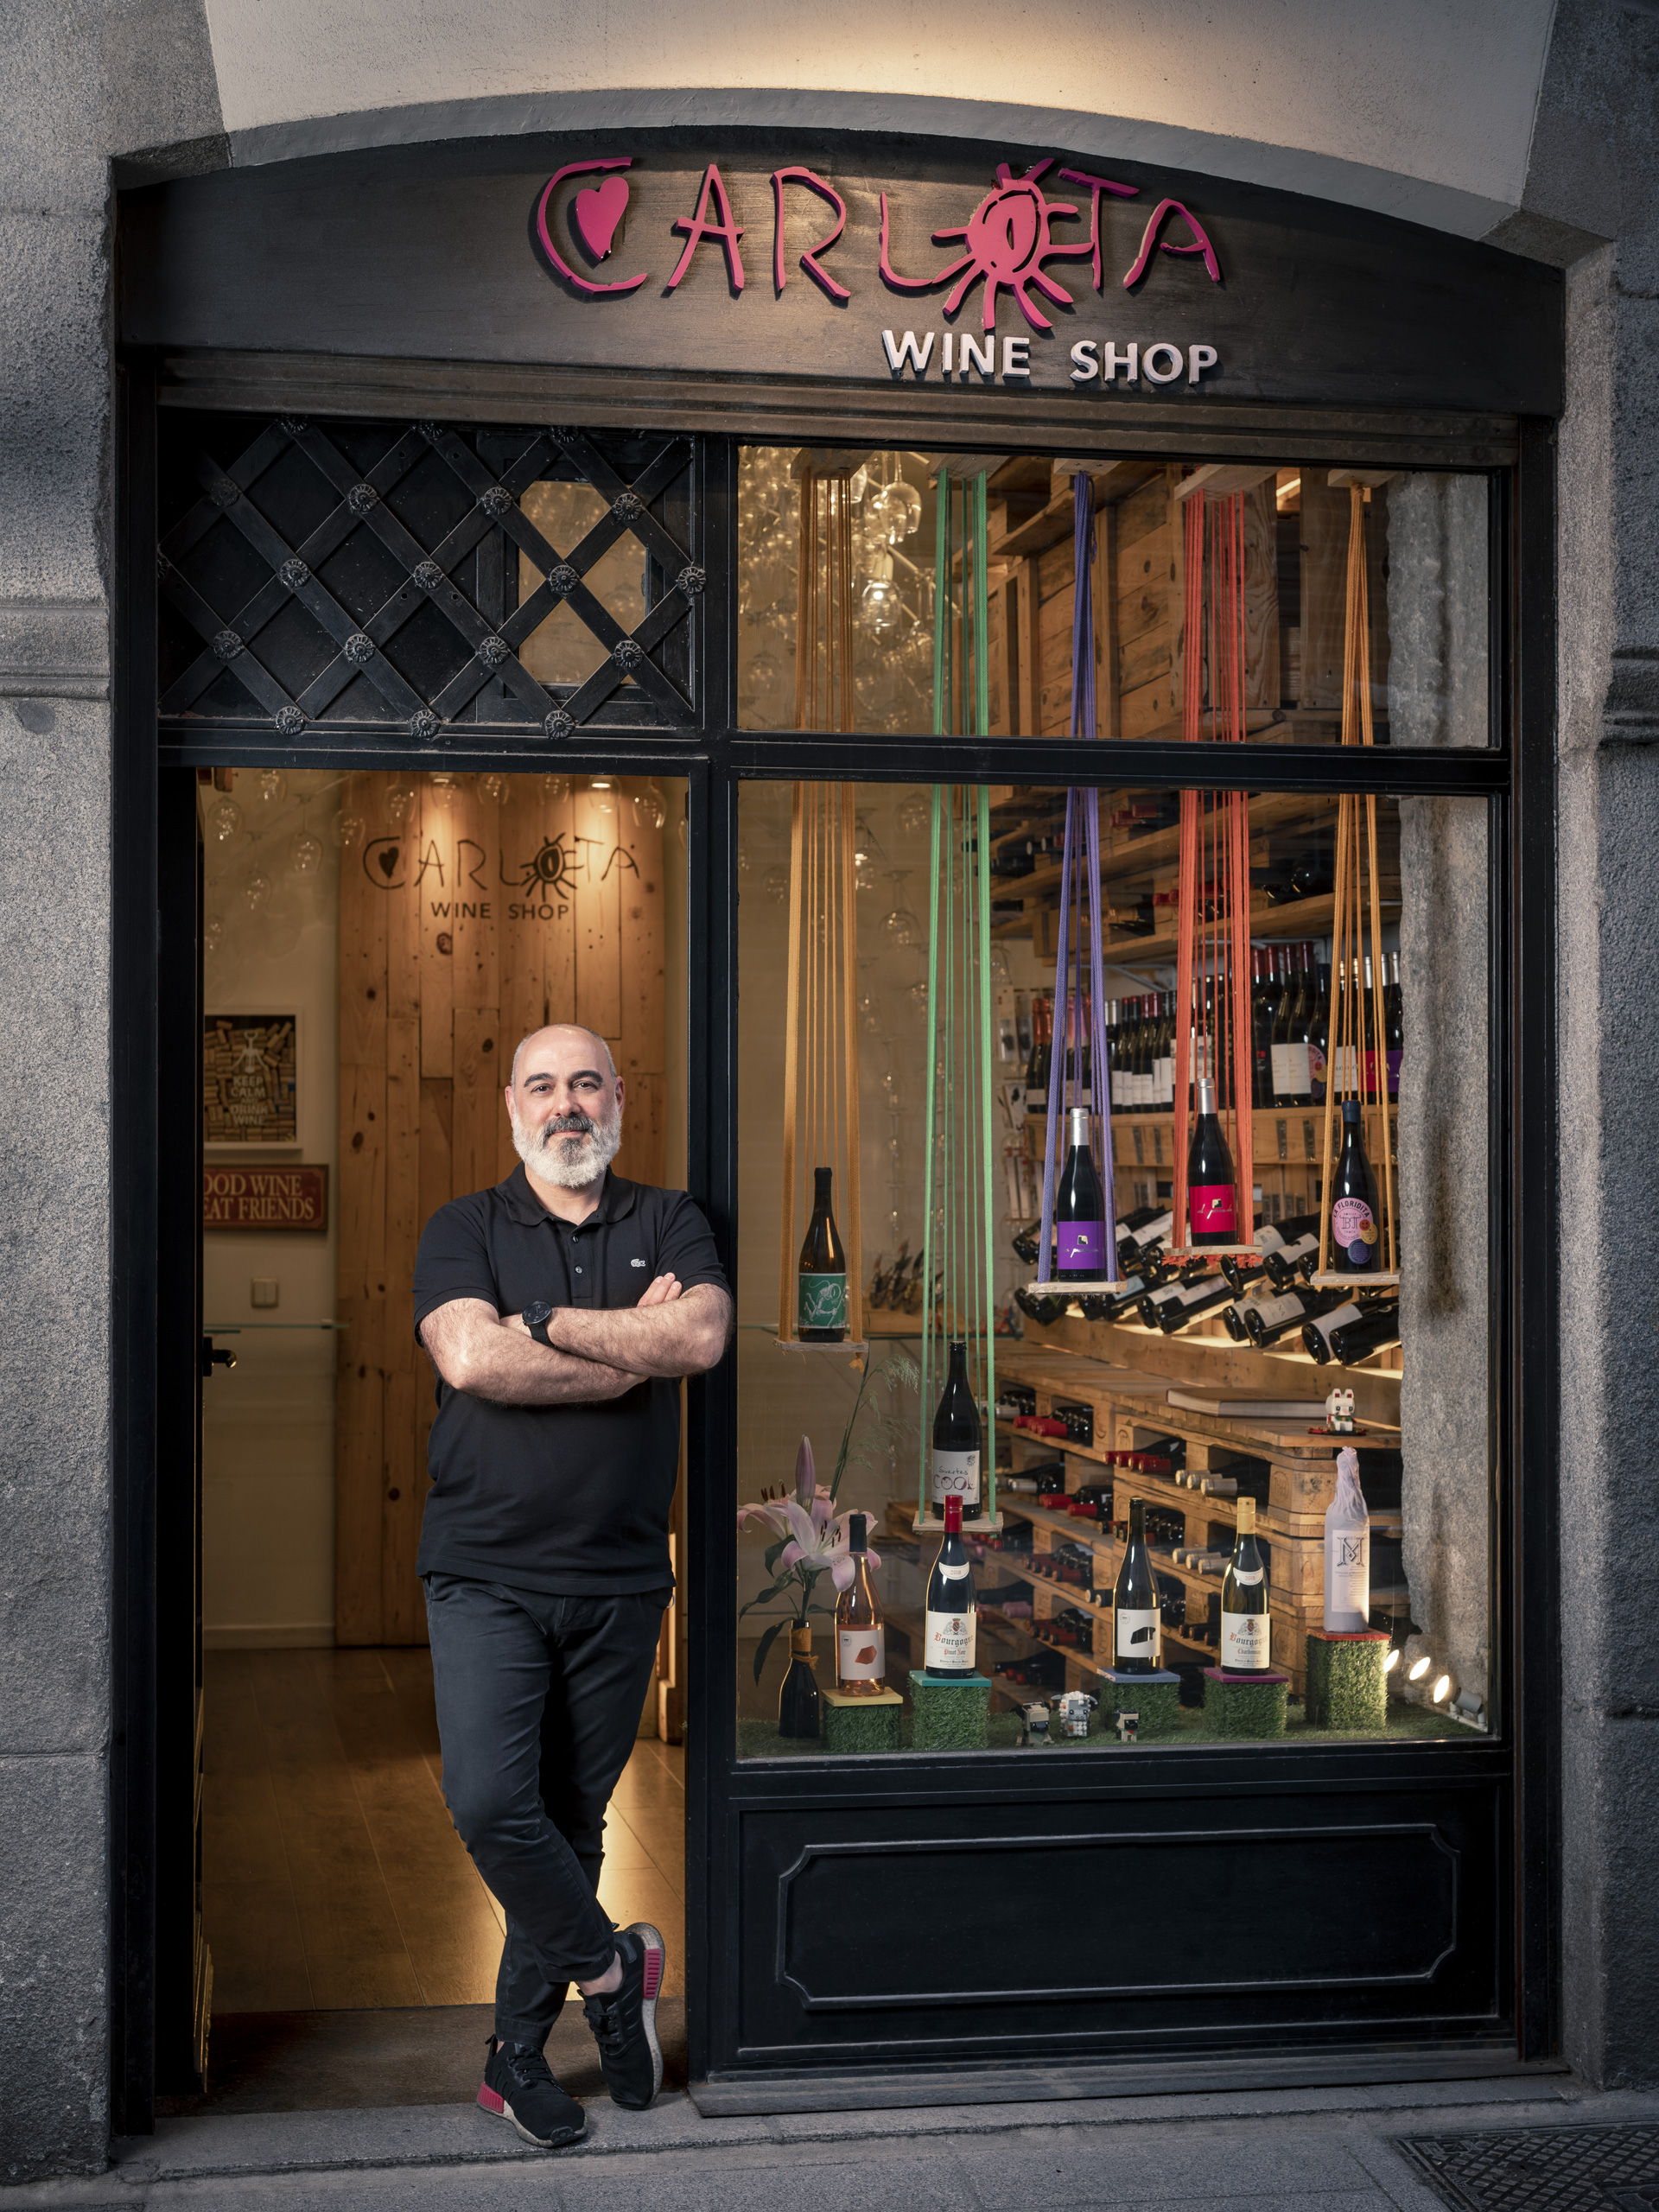 carlota wine shop tienda de vinos en madrid chueca